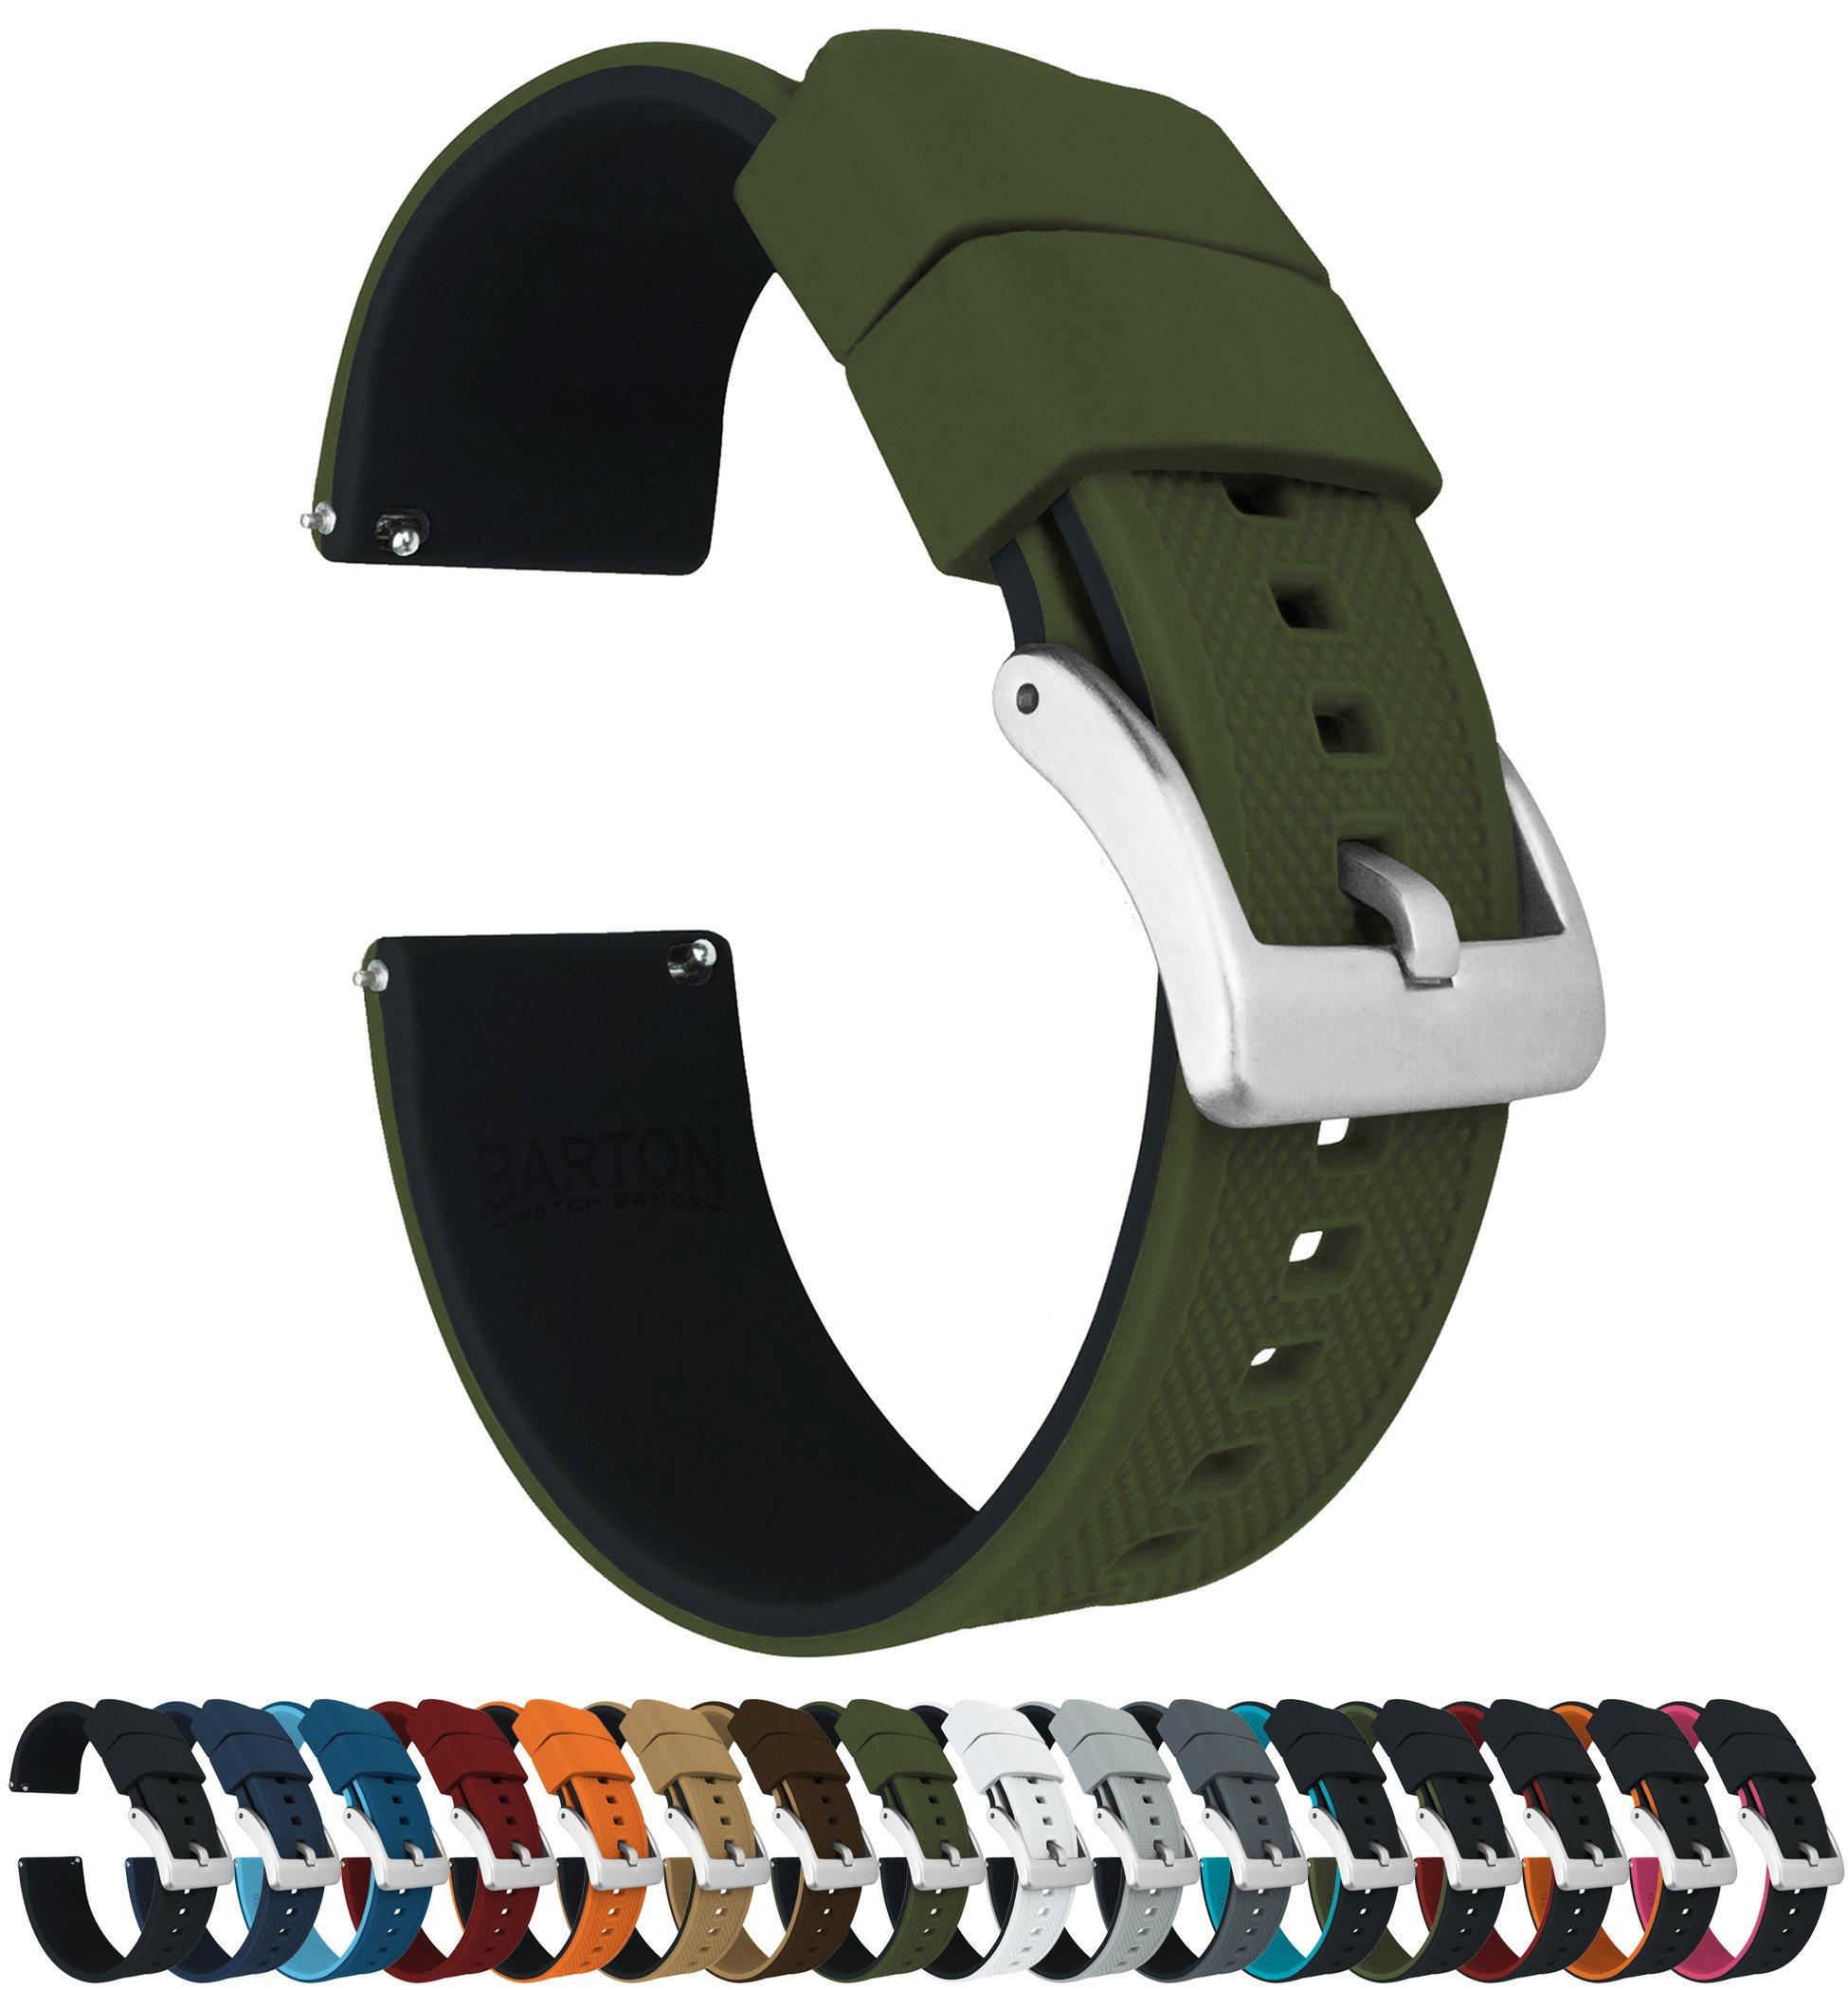 Barton Elite Silicone Watch Bands - Quick Release - Choose Color - 18mm 19mm 20mm 21mm 22mm 23mm & 24mm Watch Straps